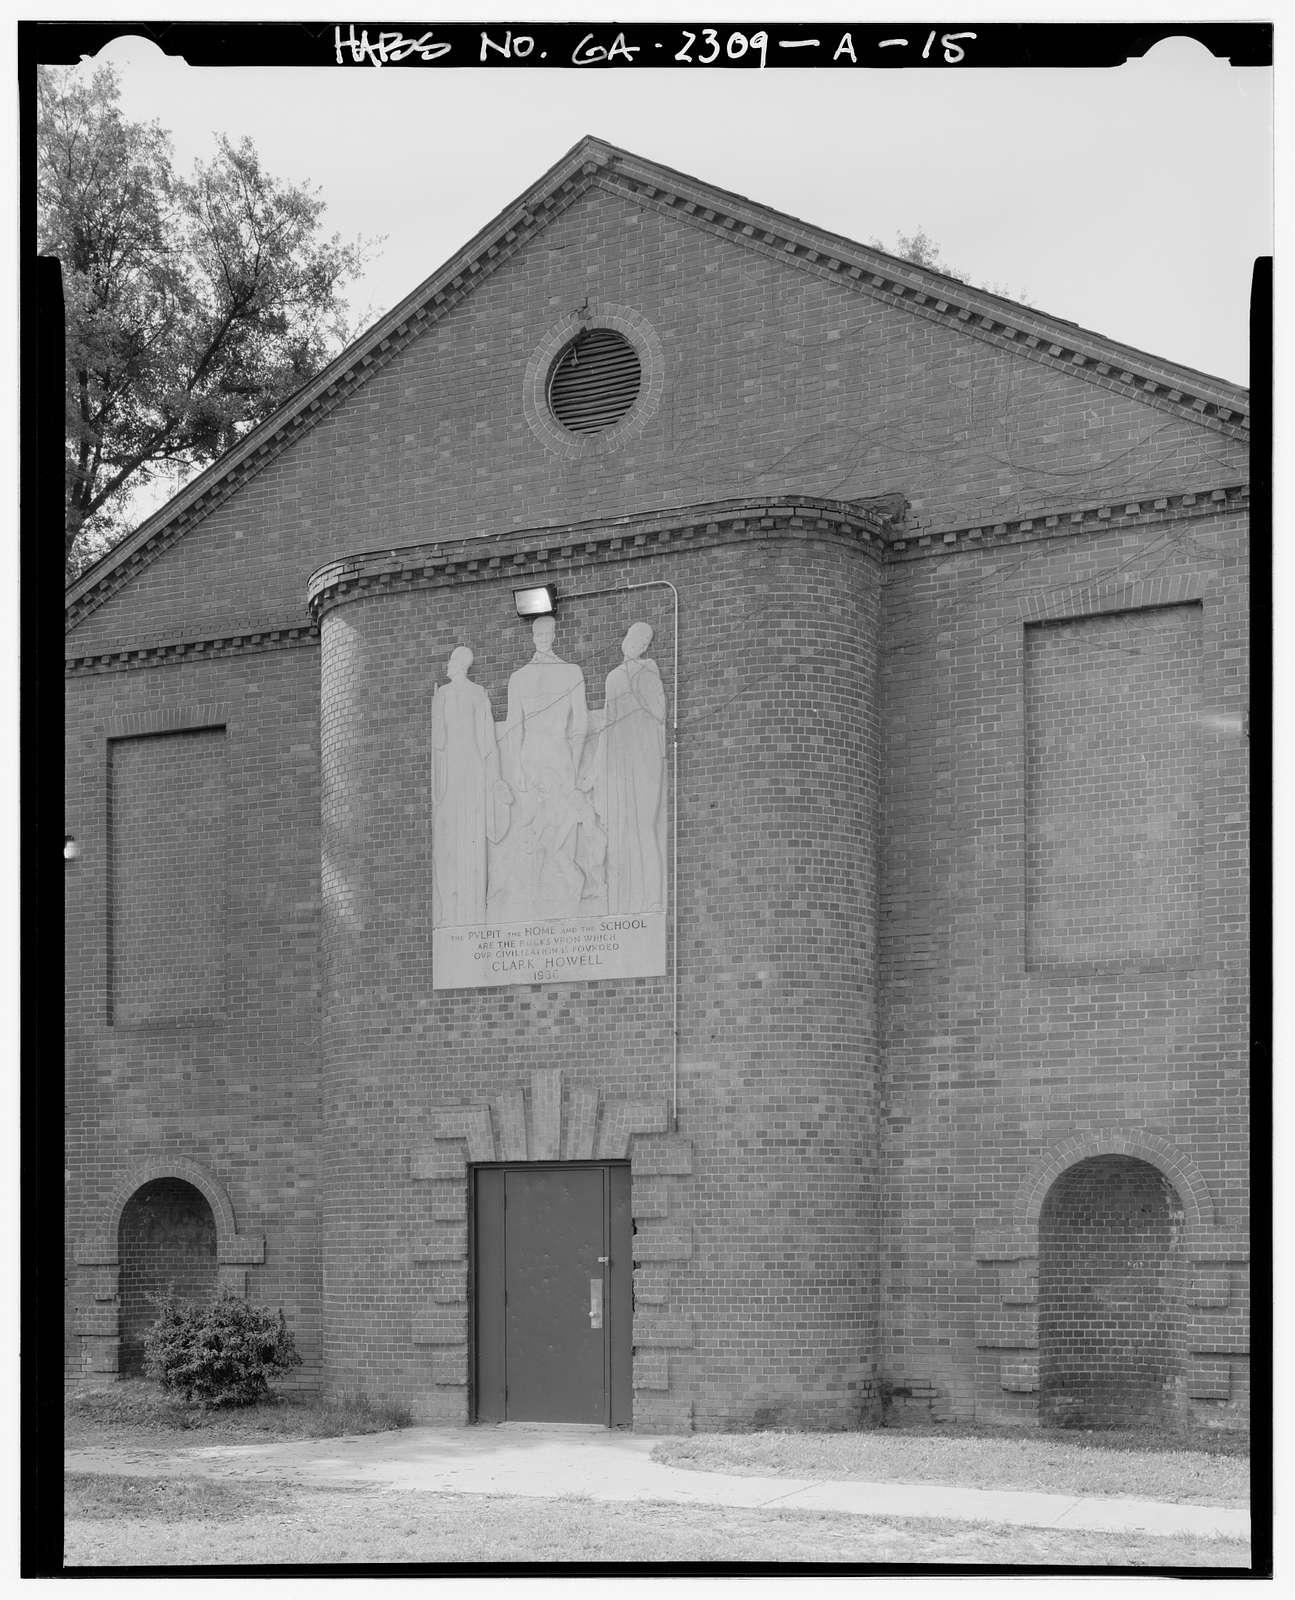 Clark Howell Homes, Community Center, 528 Lovejoy Street, Atlanta, Fulton County, GA